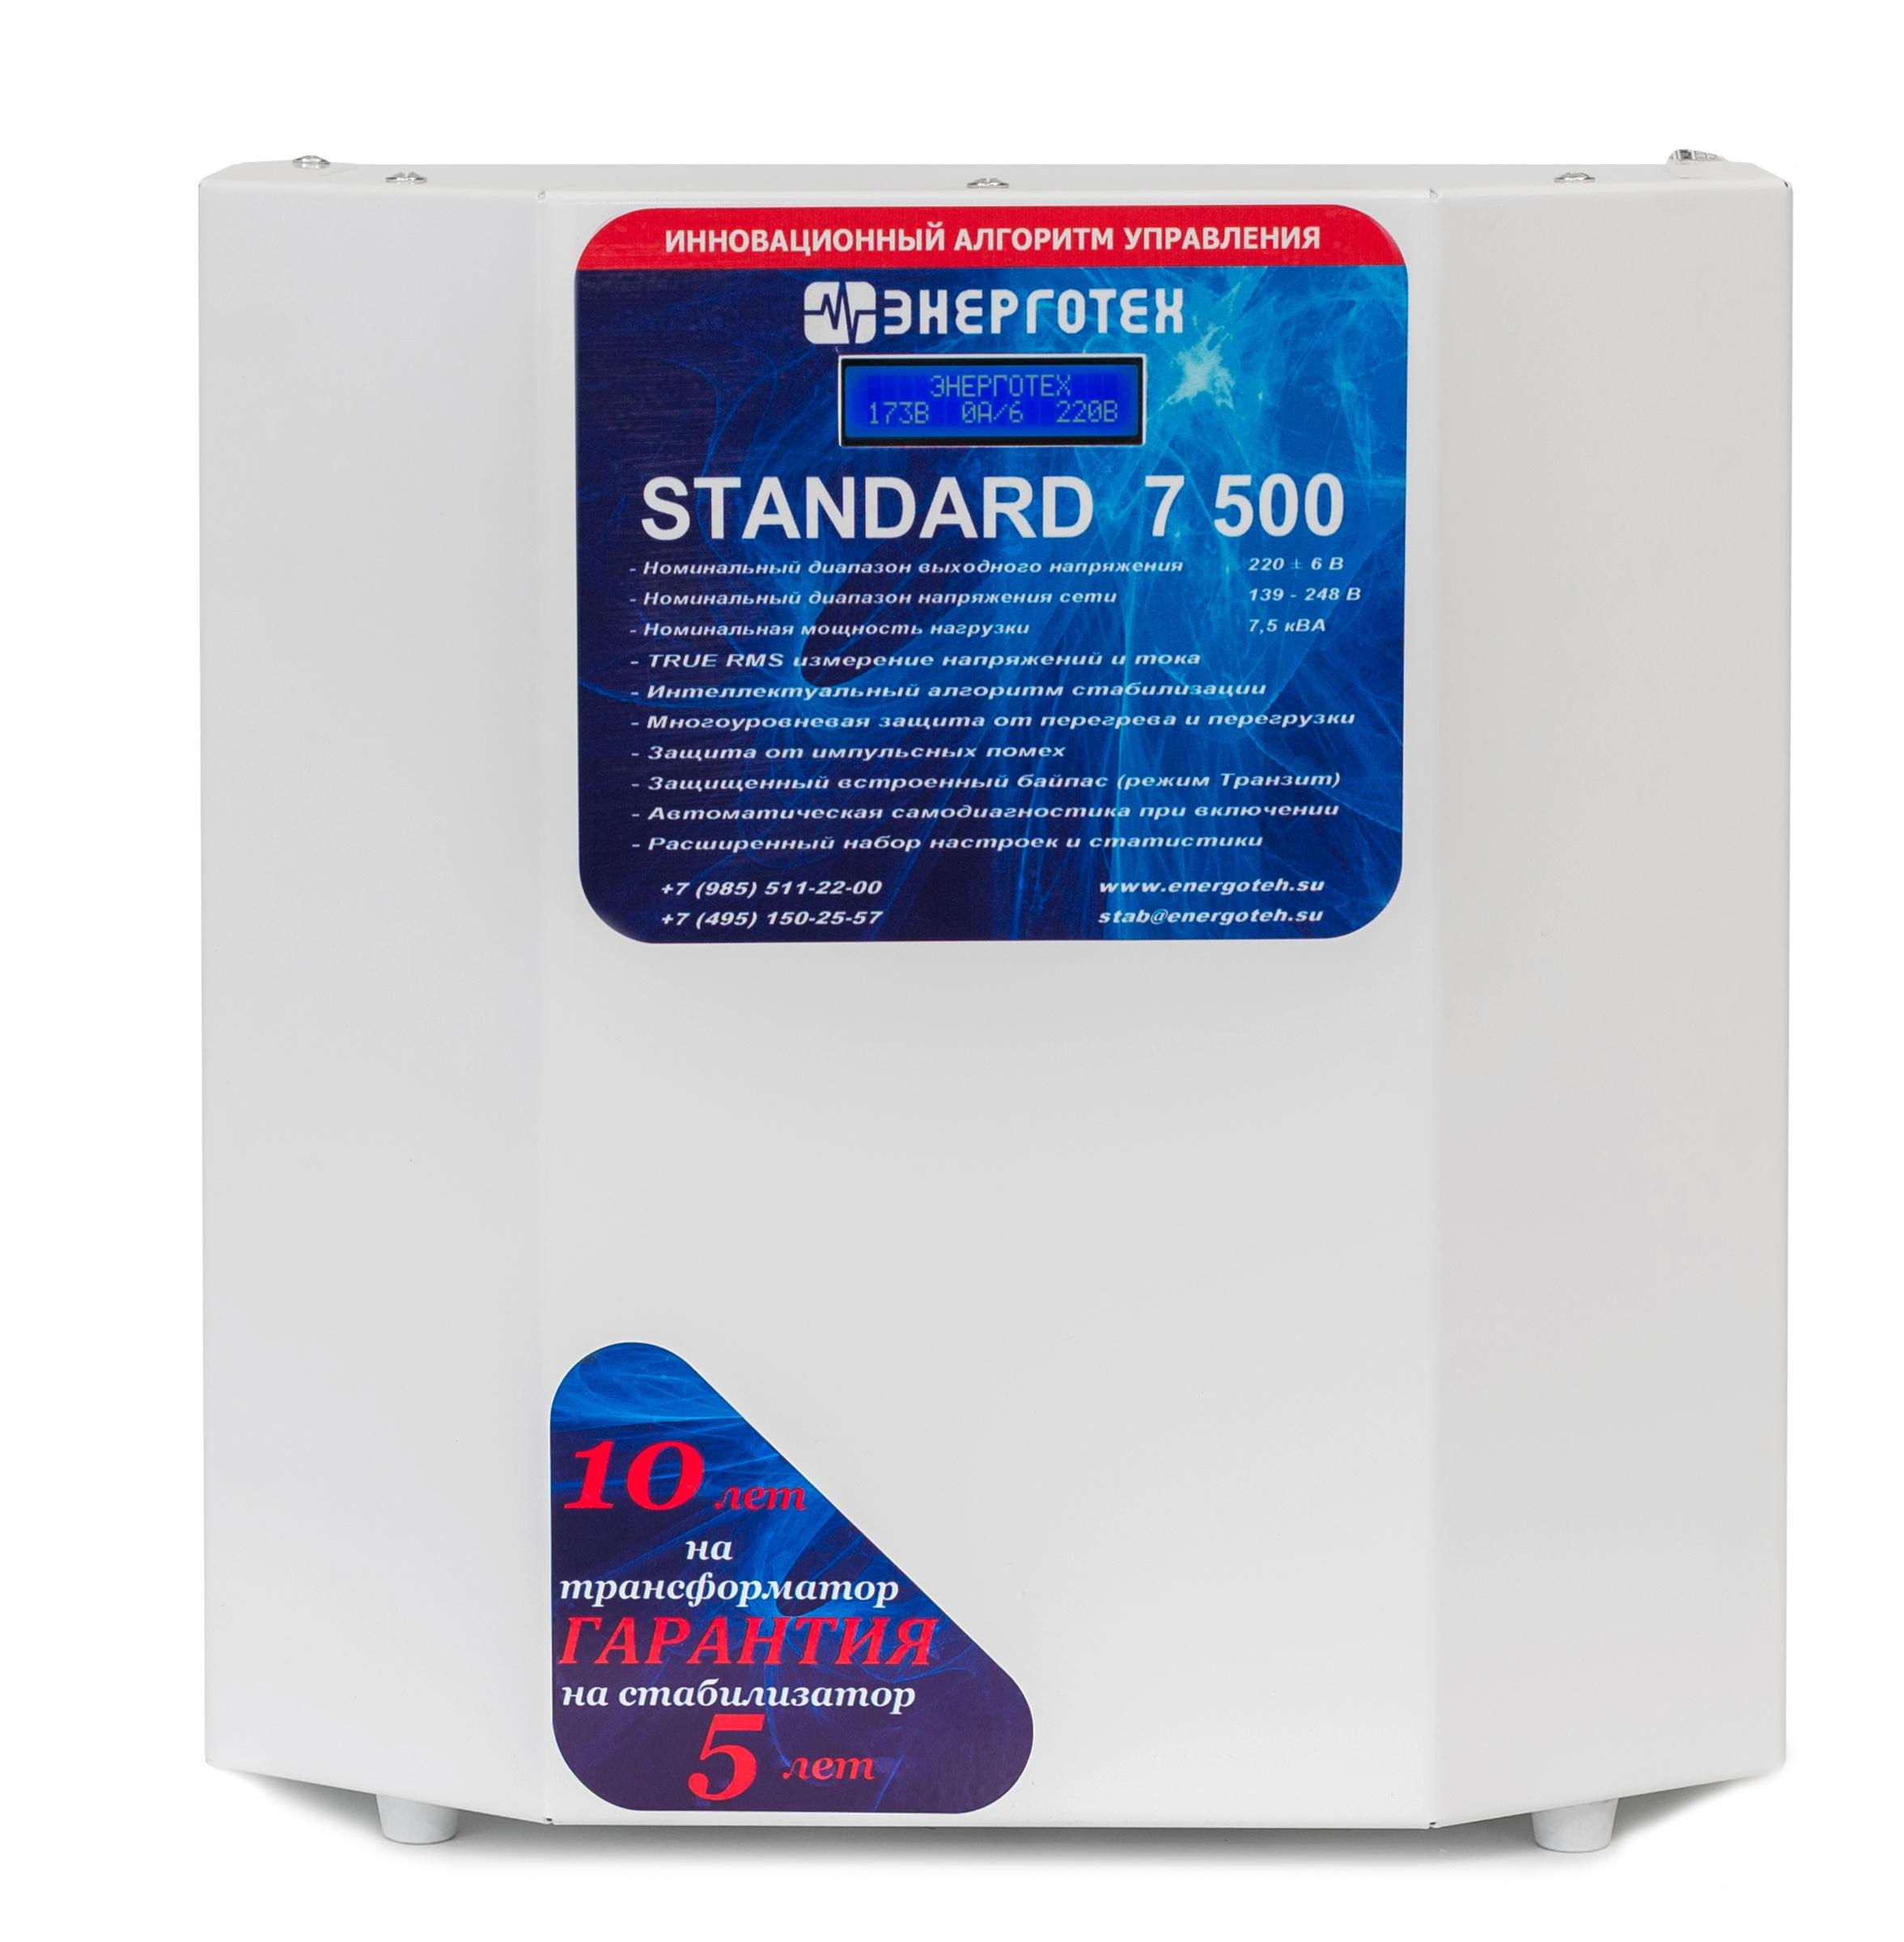 Стабилизатор напряжения ЭНЕРГОТЕХ Standard 7500 (lv) compatible bare bulb lv lp06 4642a001 for canon lv 7525 lv 7525e lv 7535 lv 7535u projector lamp bulb without housing